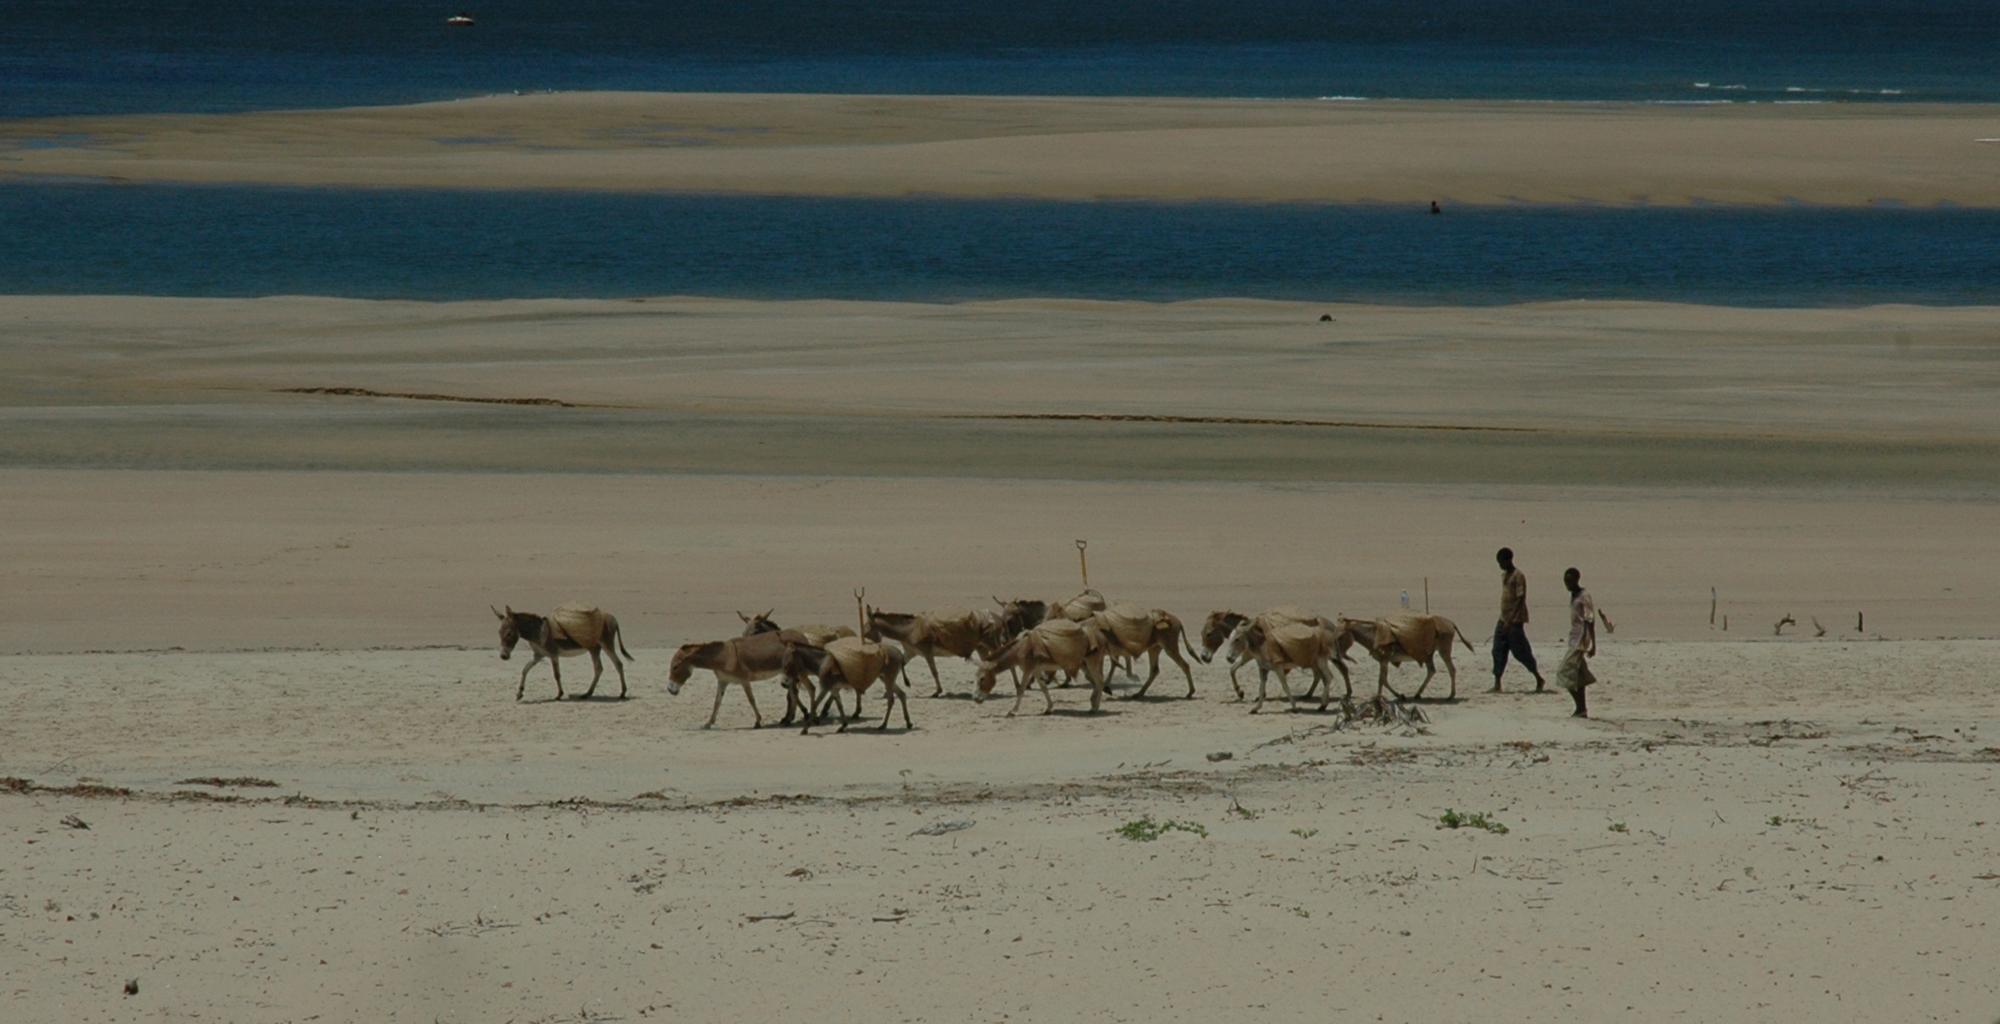 Kenya-The-Fort-Beach-Walk